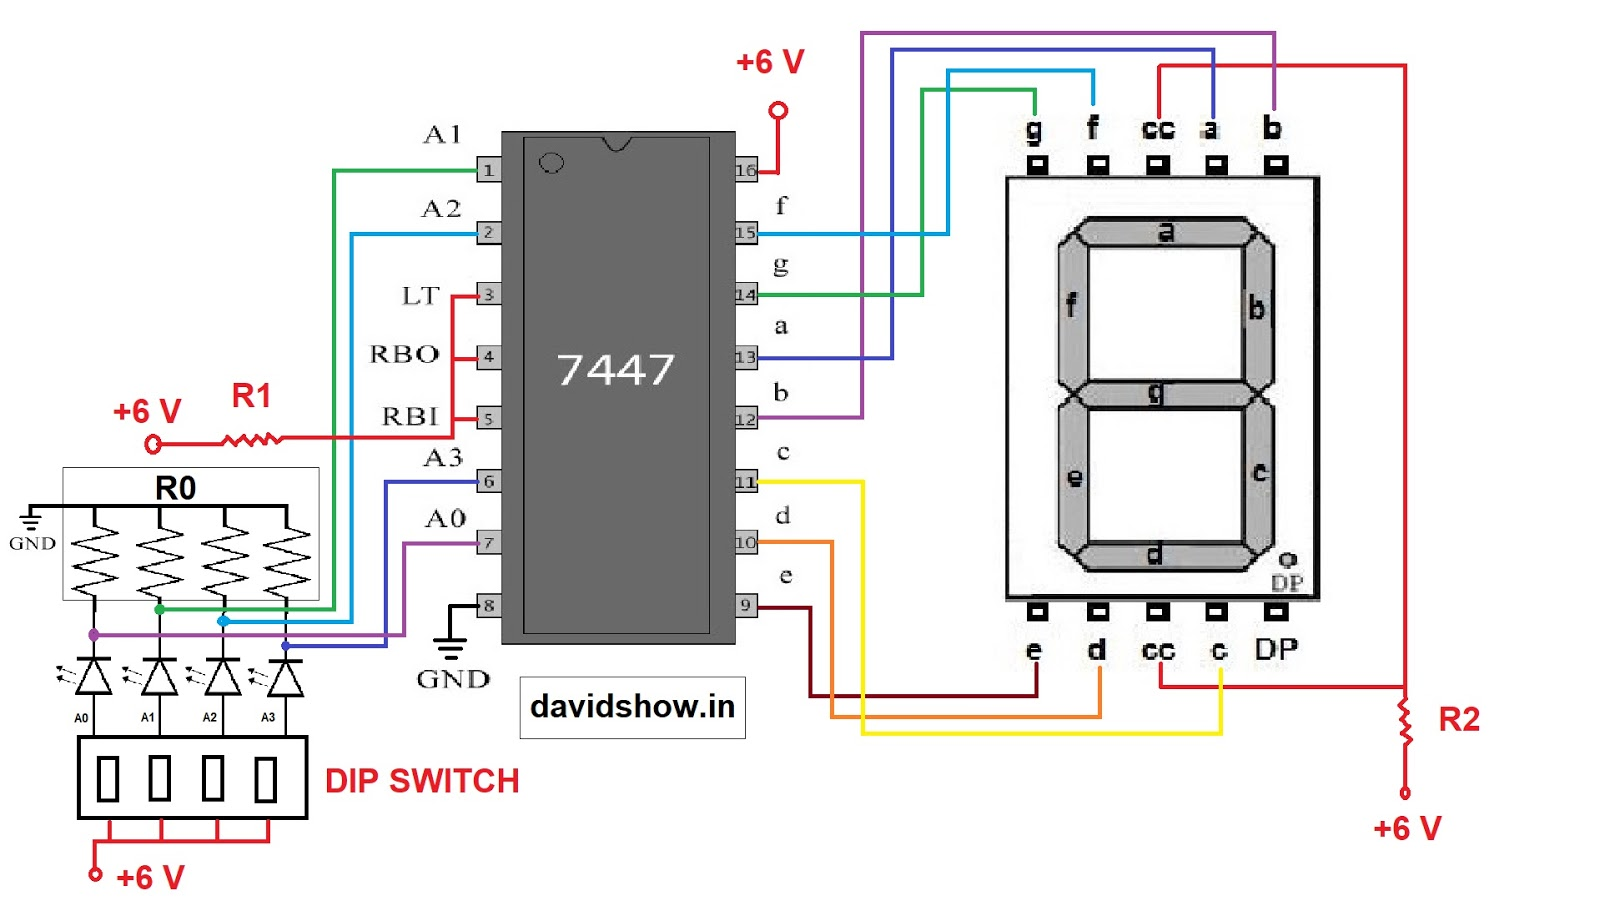 Seven Segment Pin Diagram John Deere Lawn Tractor Ignition Switch Wiring 7447 Display Working David Show